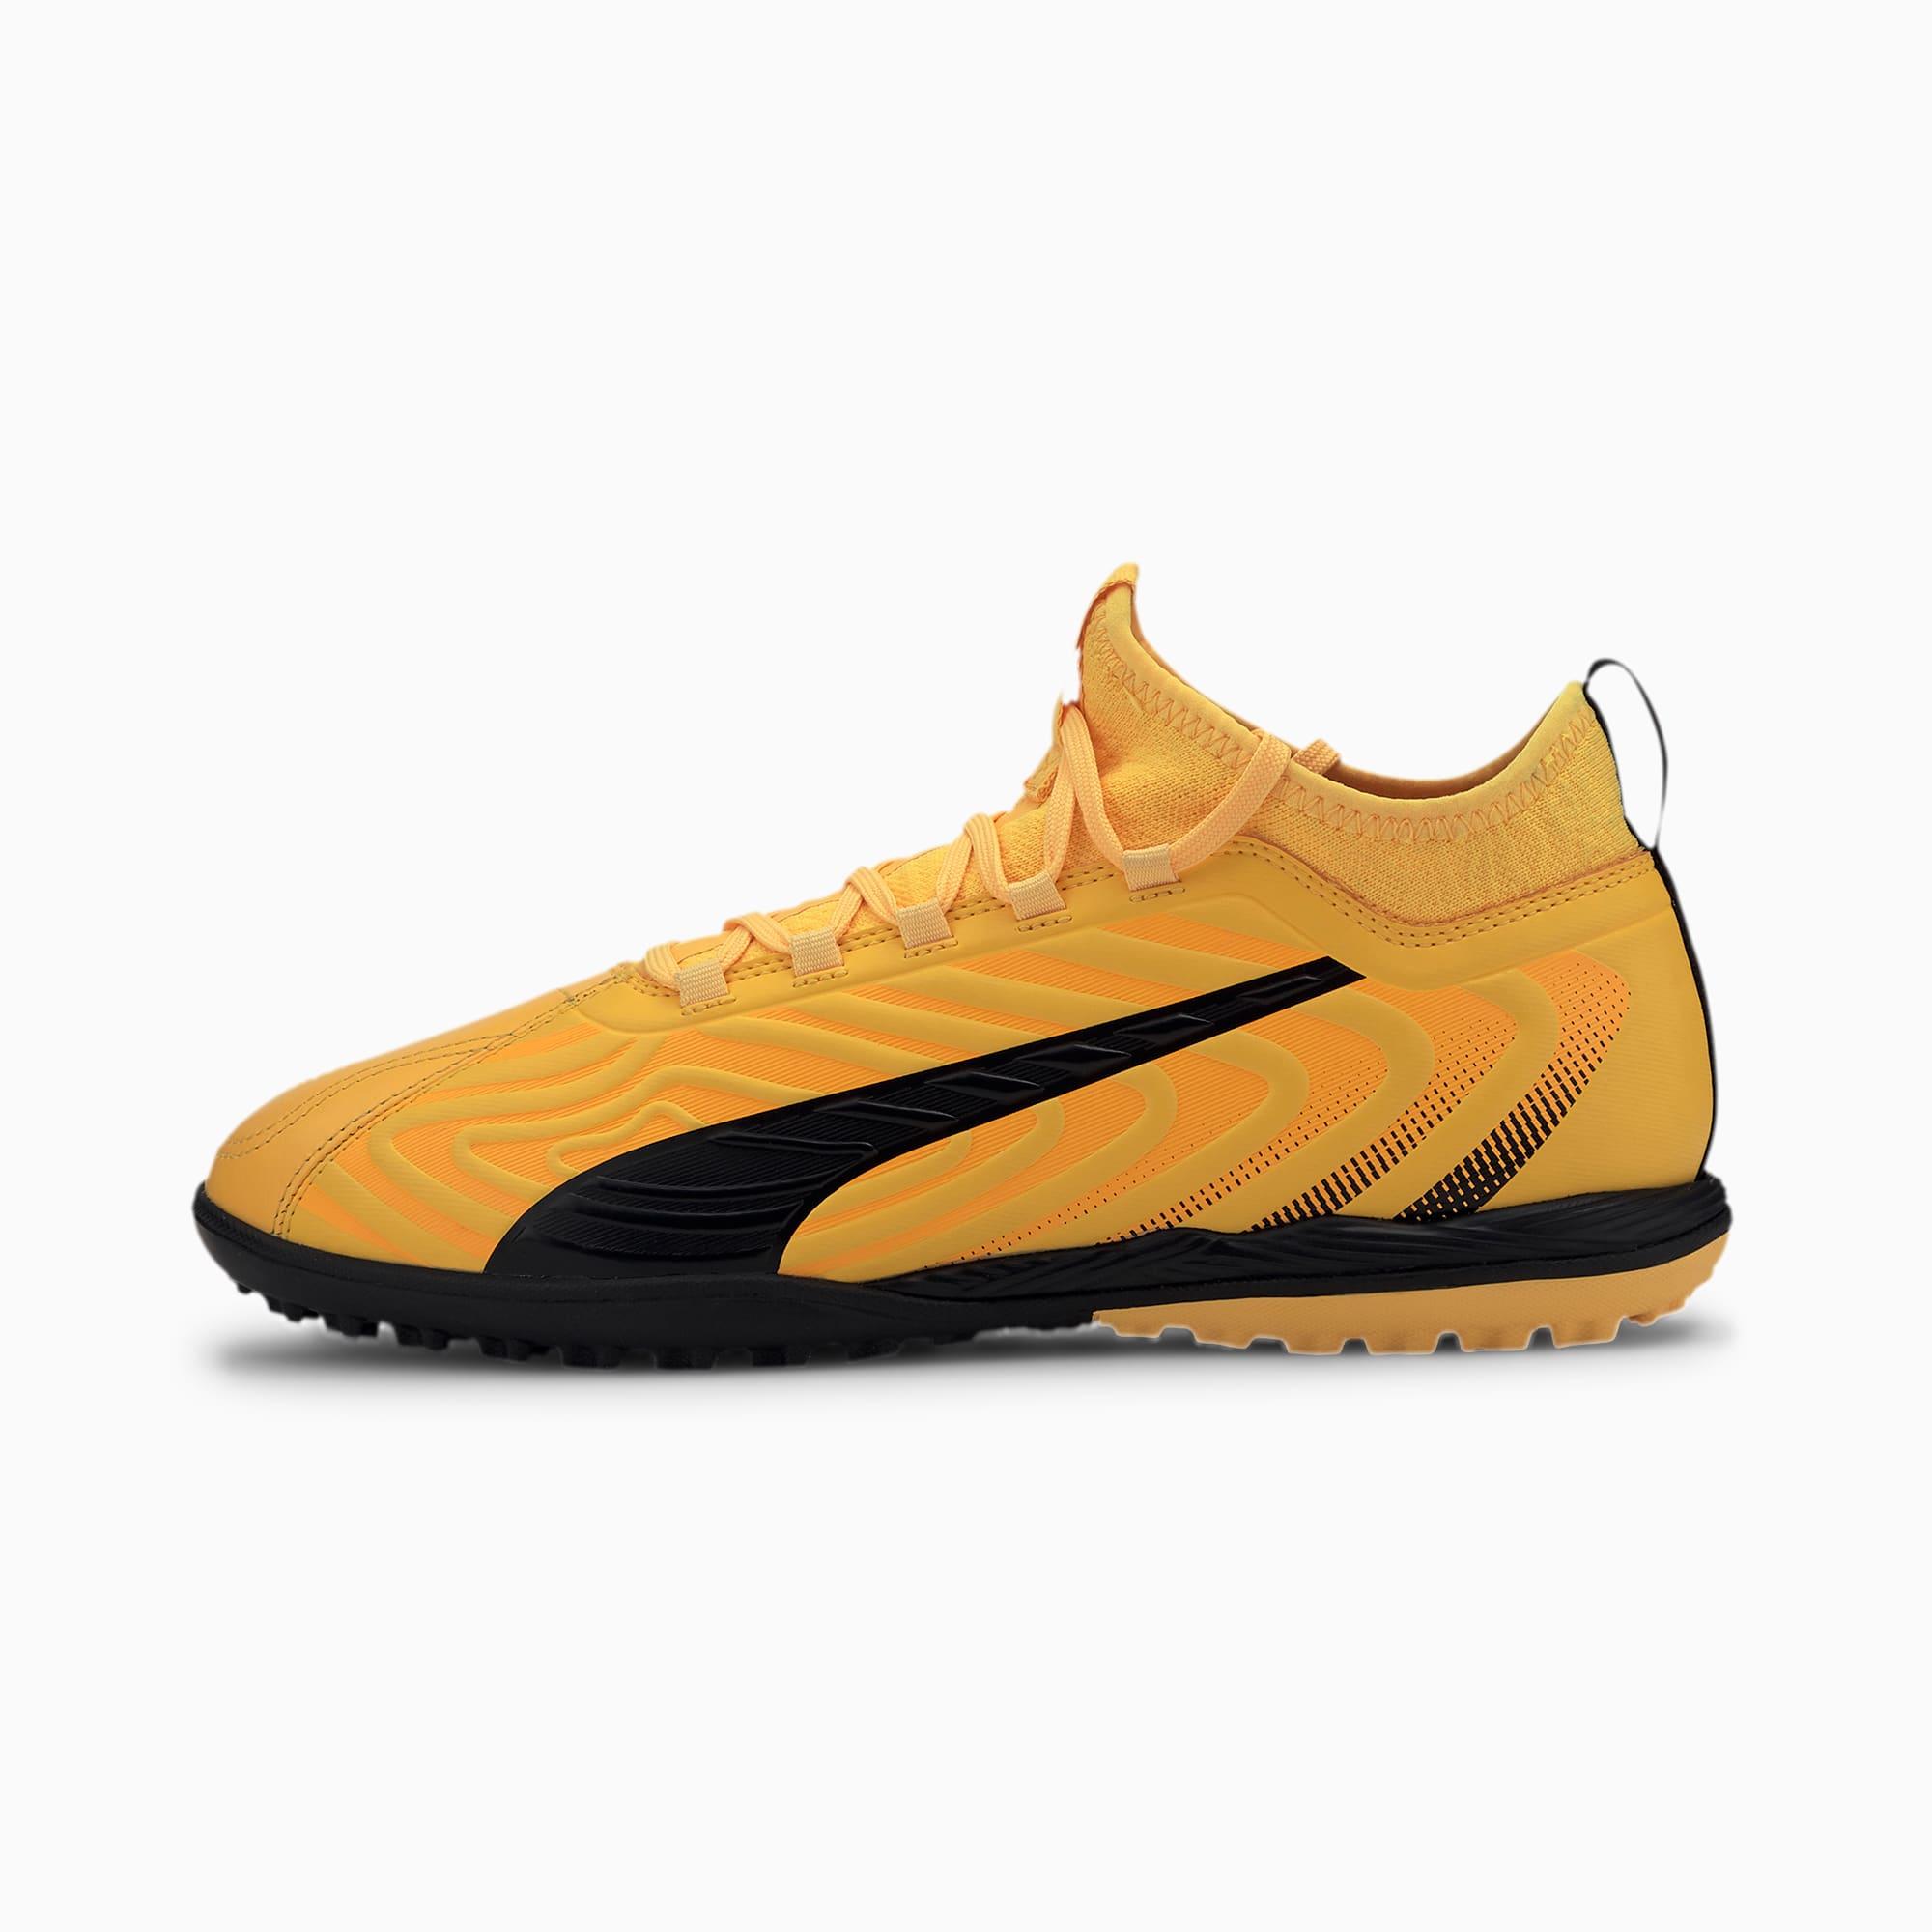 PUMA ONE 20.3 TT Men's Soccer Shoes